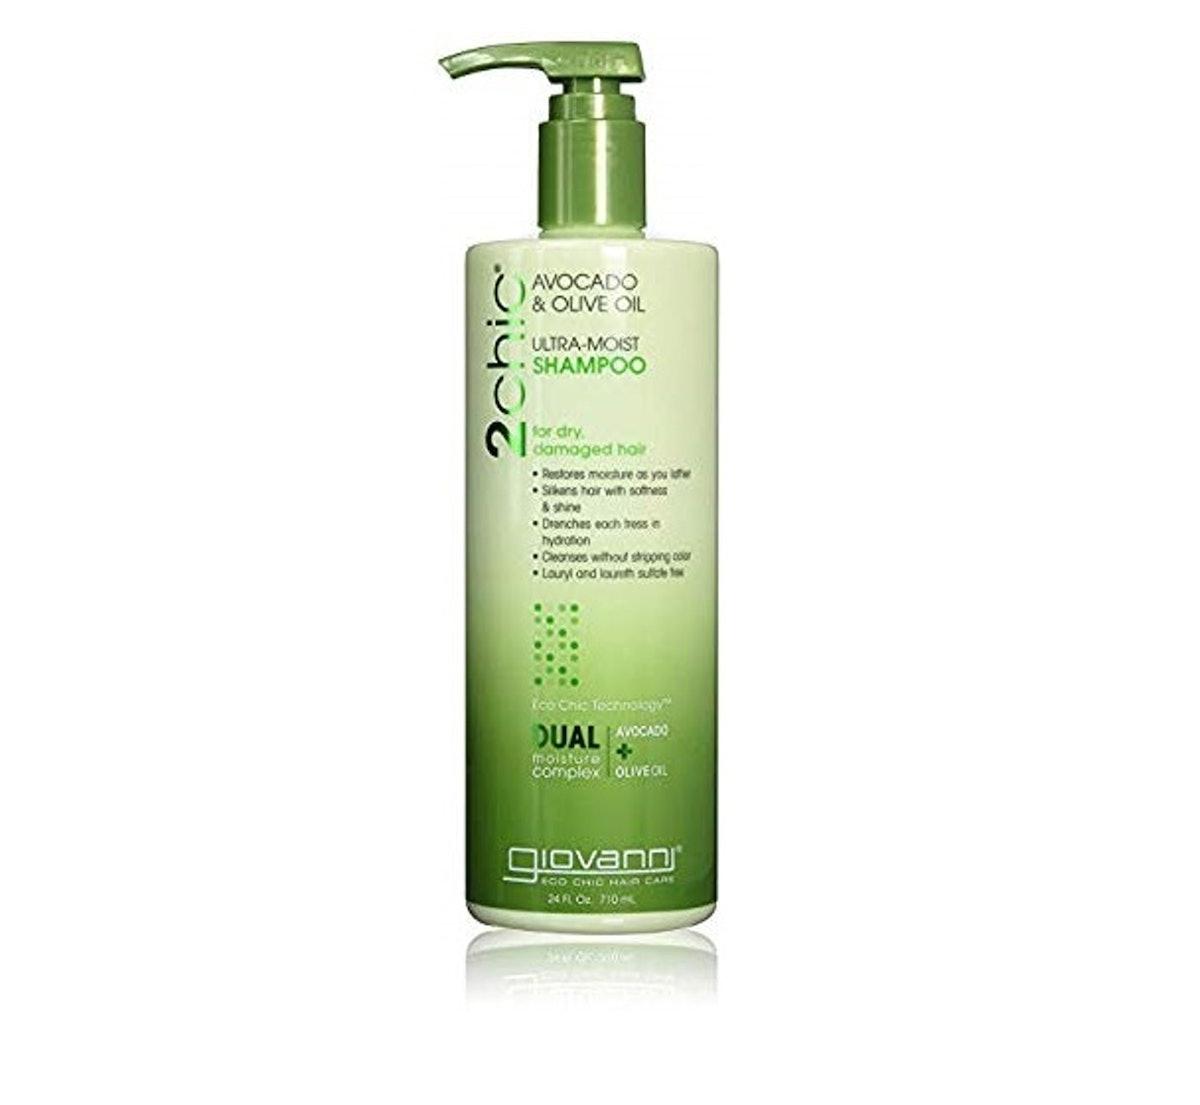 GIOVANNI Avocado And Olive Oil Shampoo